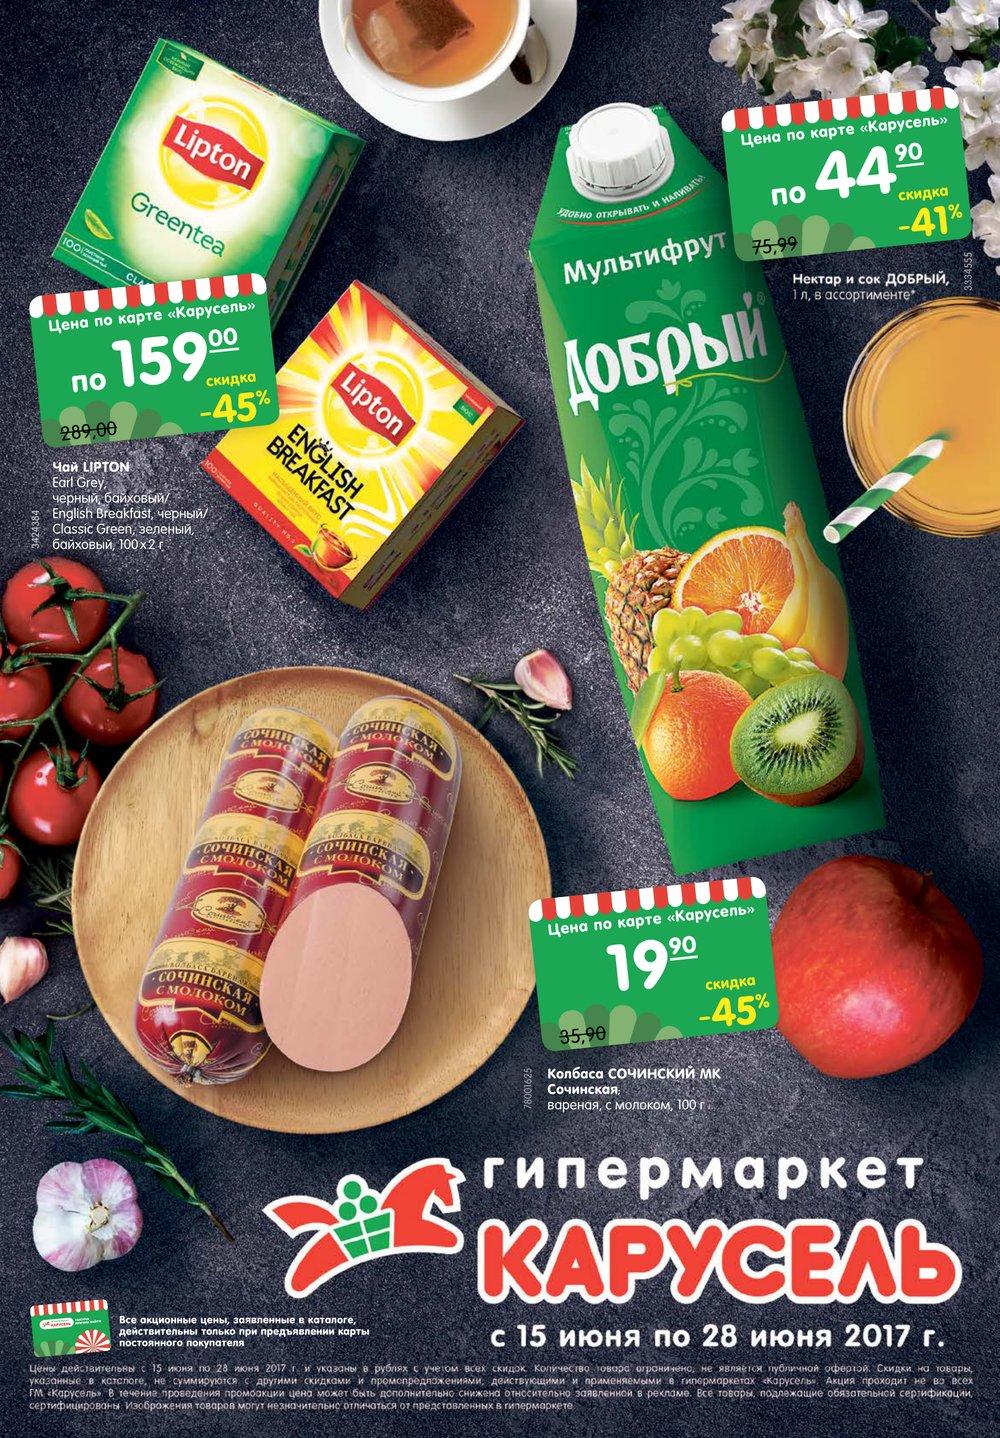 Каталог акций Карусель с 15 по 28 июня 2017 - стр. 1